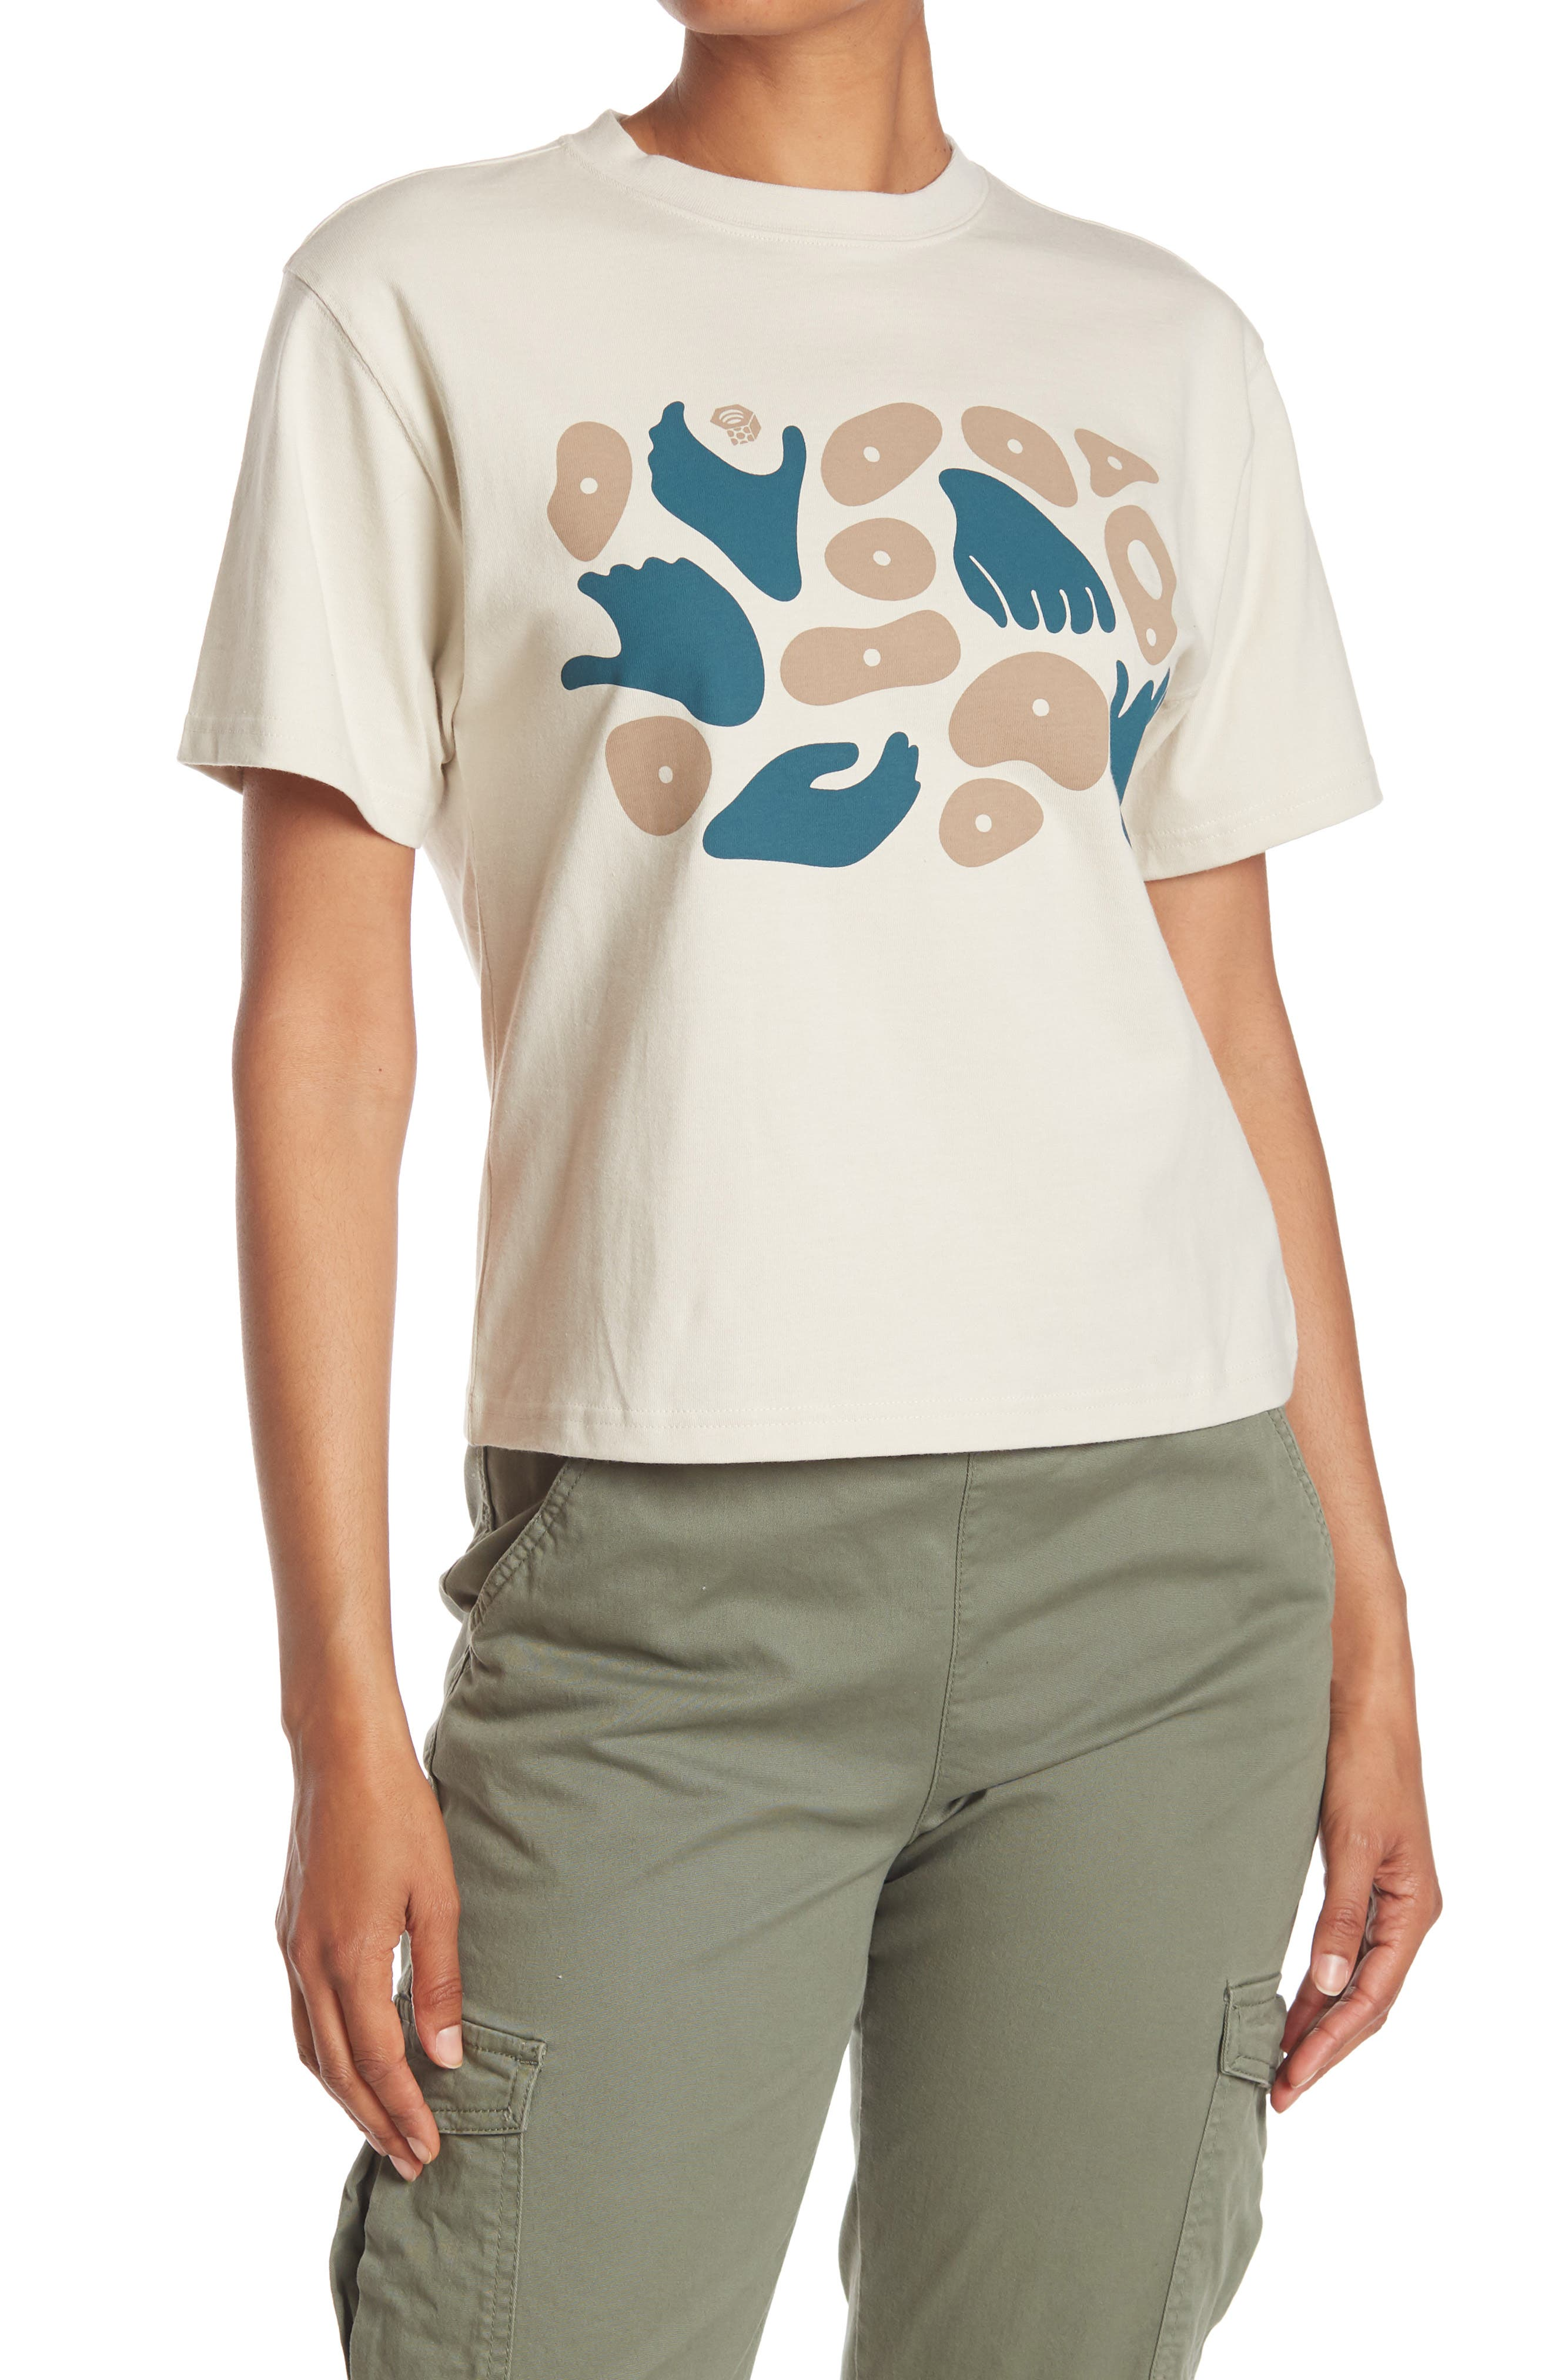 Image of MOUNTAIN HARDWEAR Handhold Graphic Short Sleeve T-Shirt